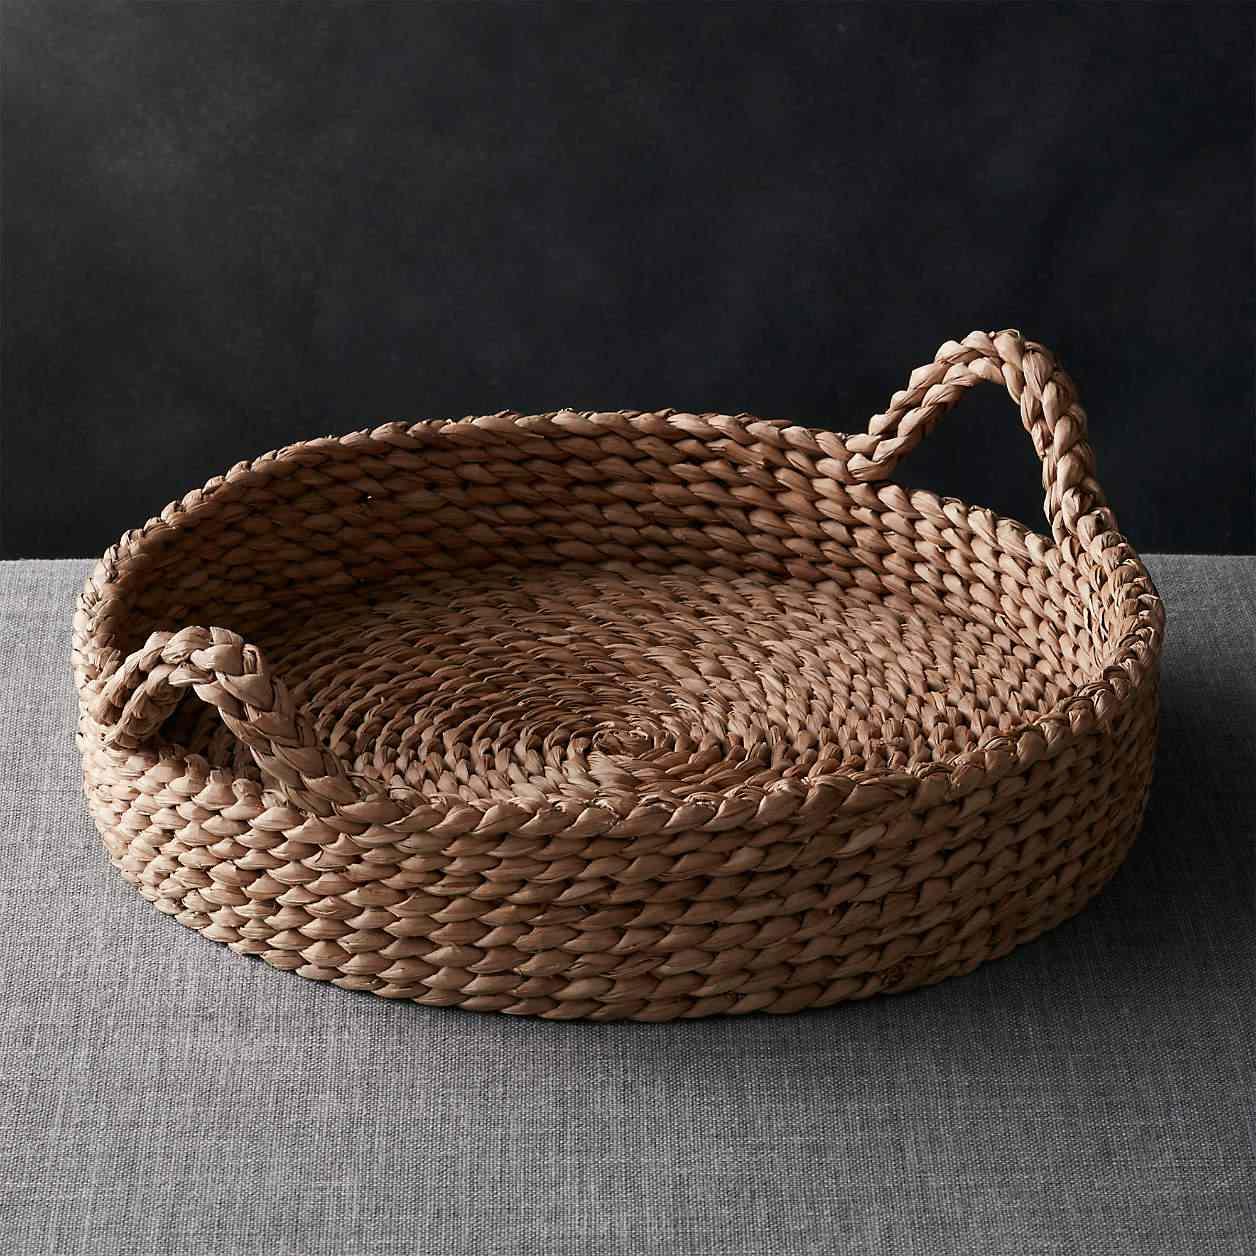 A woven basket tray